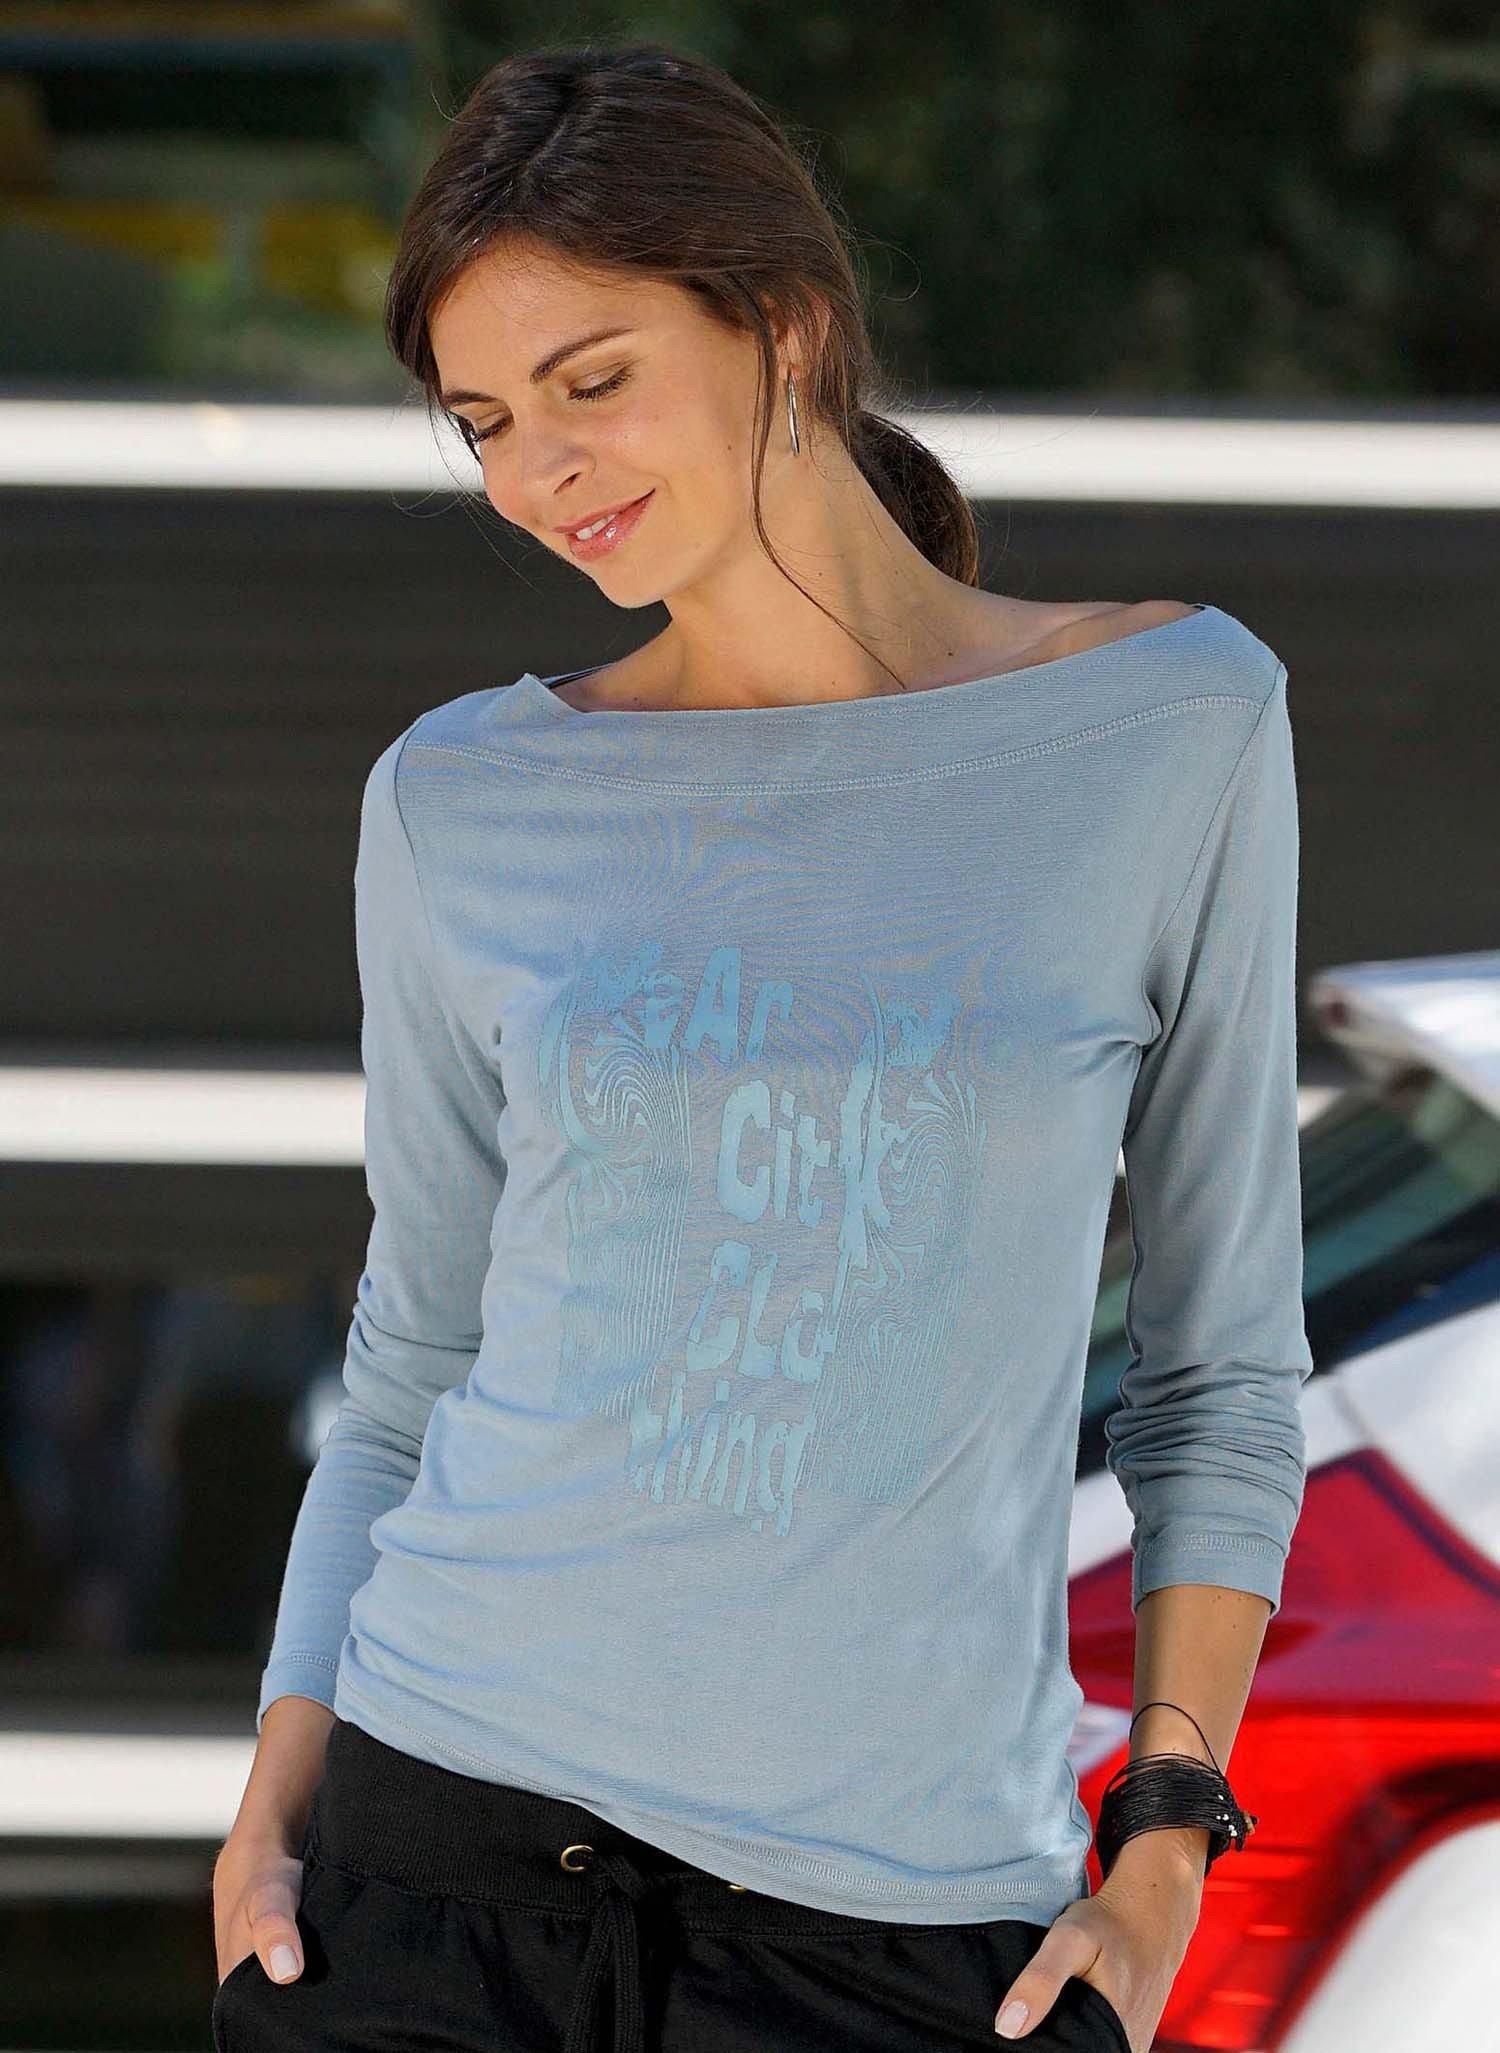 D-LA-Shirt Ethno-Print türkis L 069 - 2 - Ronja.ch